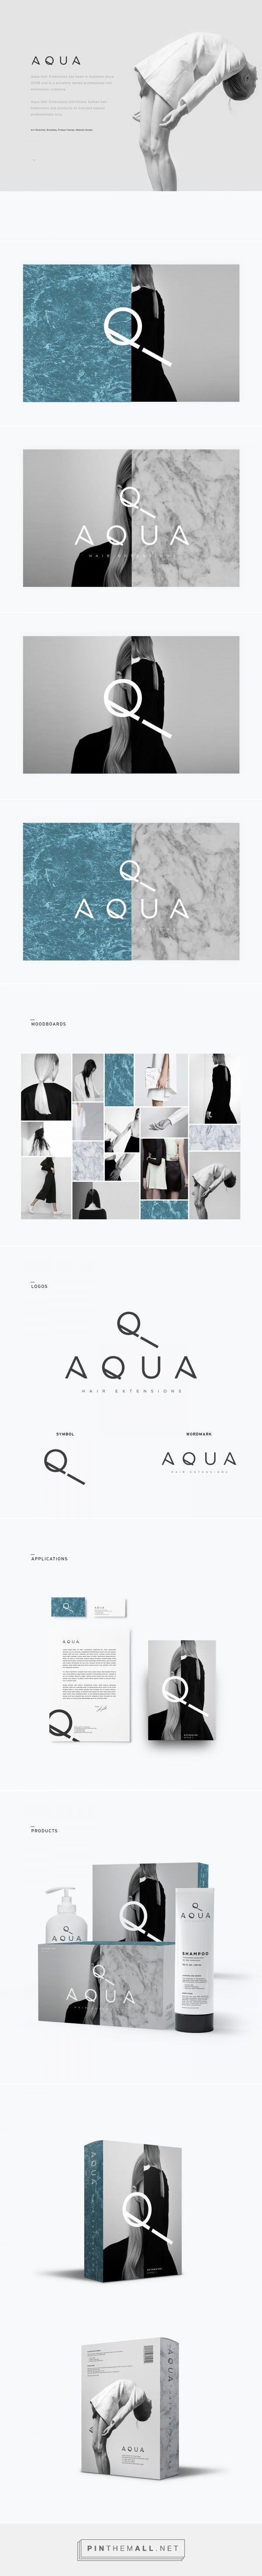 Aqua - Hair Extensions on Behance {cT}                              …